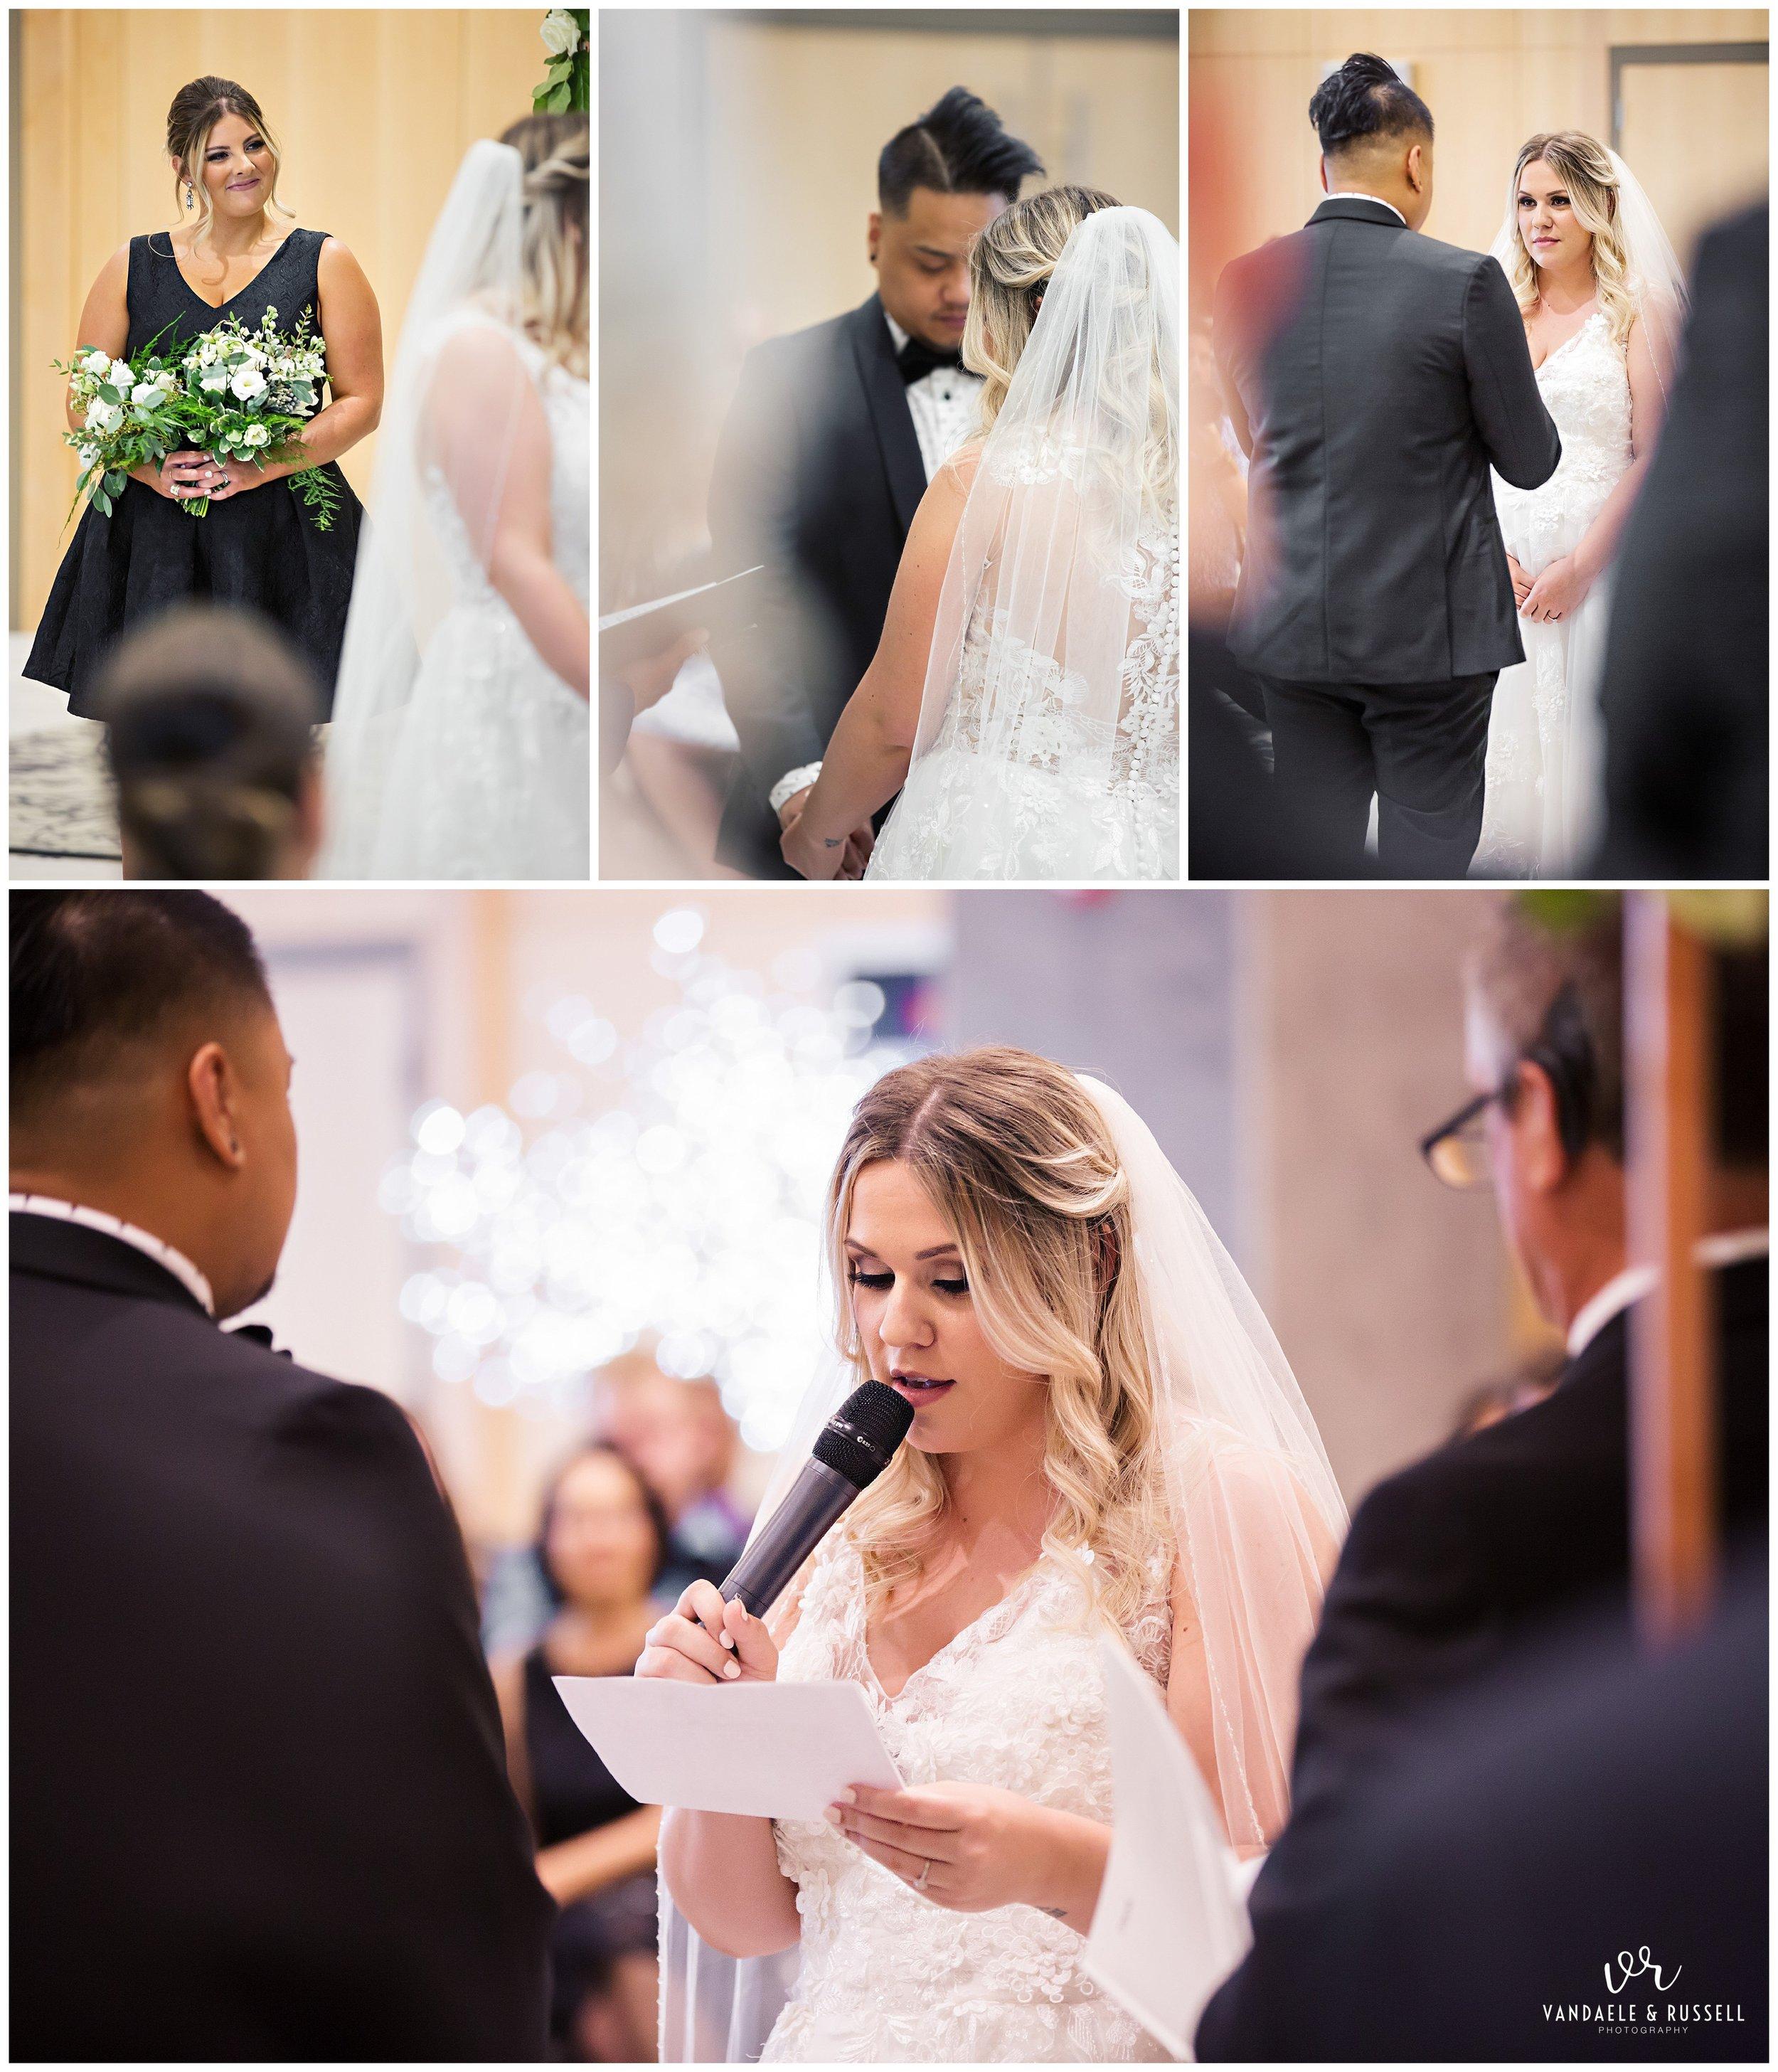 VanDaele-Russell-Wedding-Photography-London-Toronto-Ontario_0098.jpg